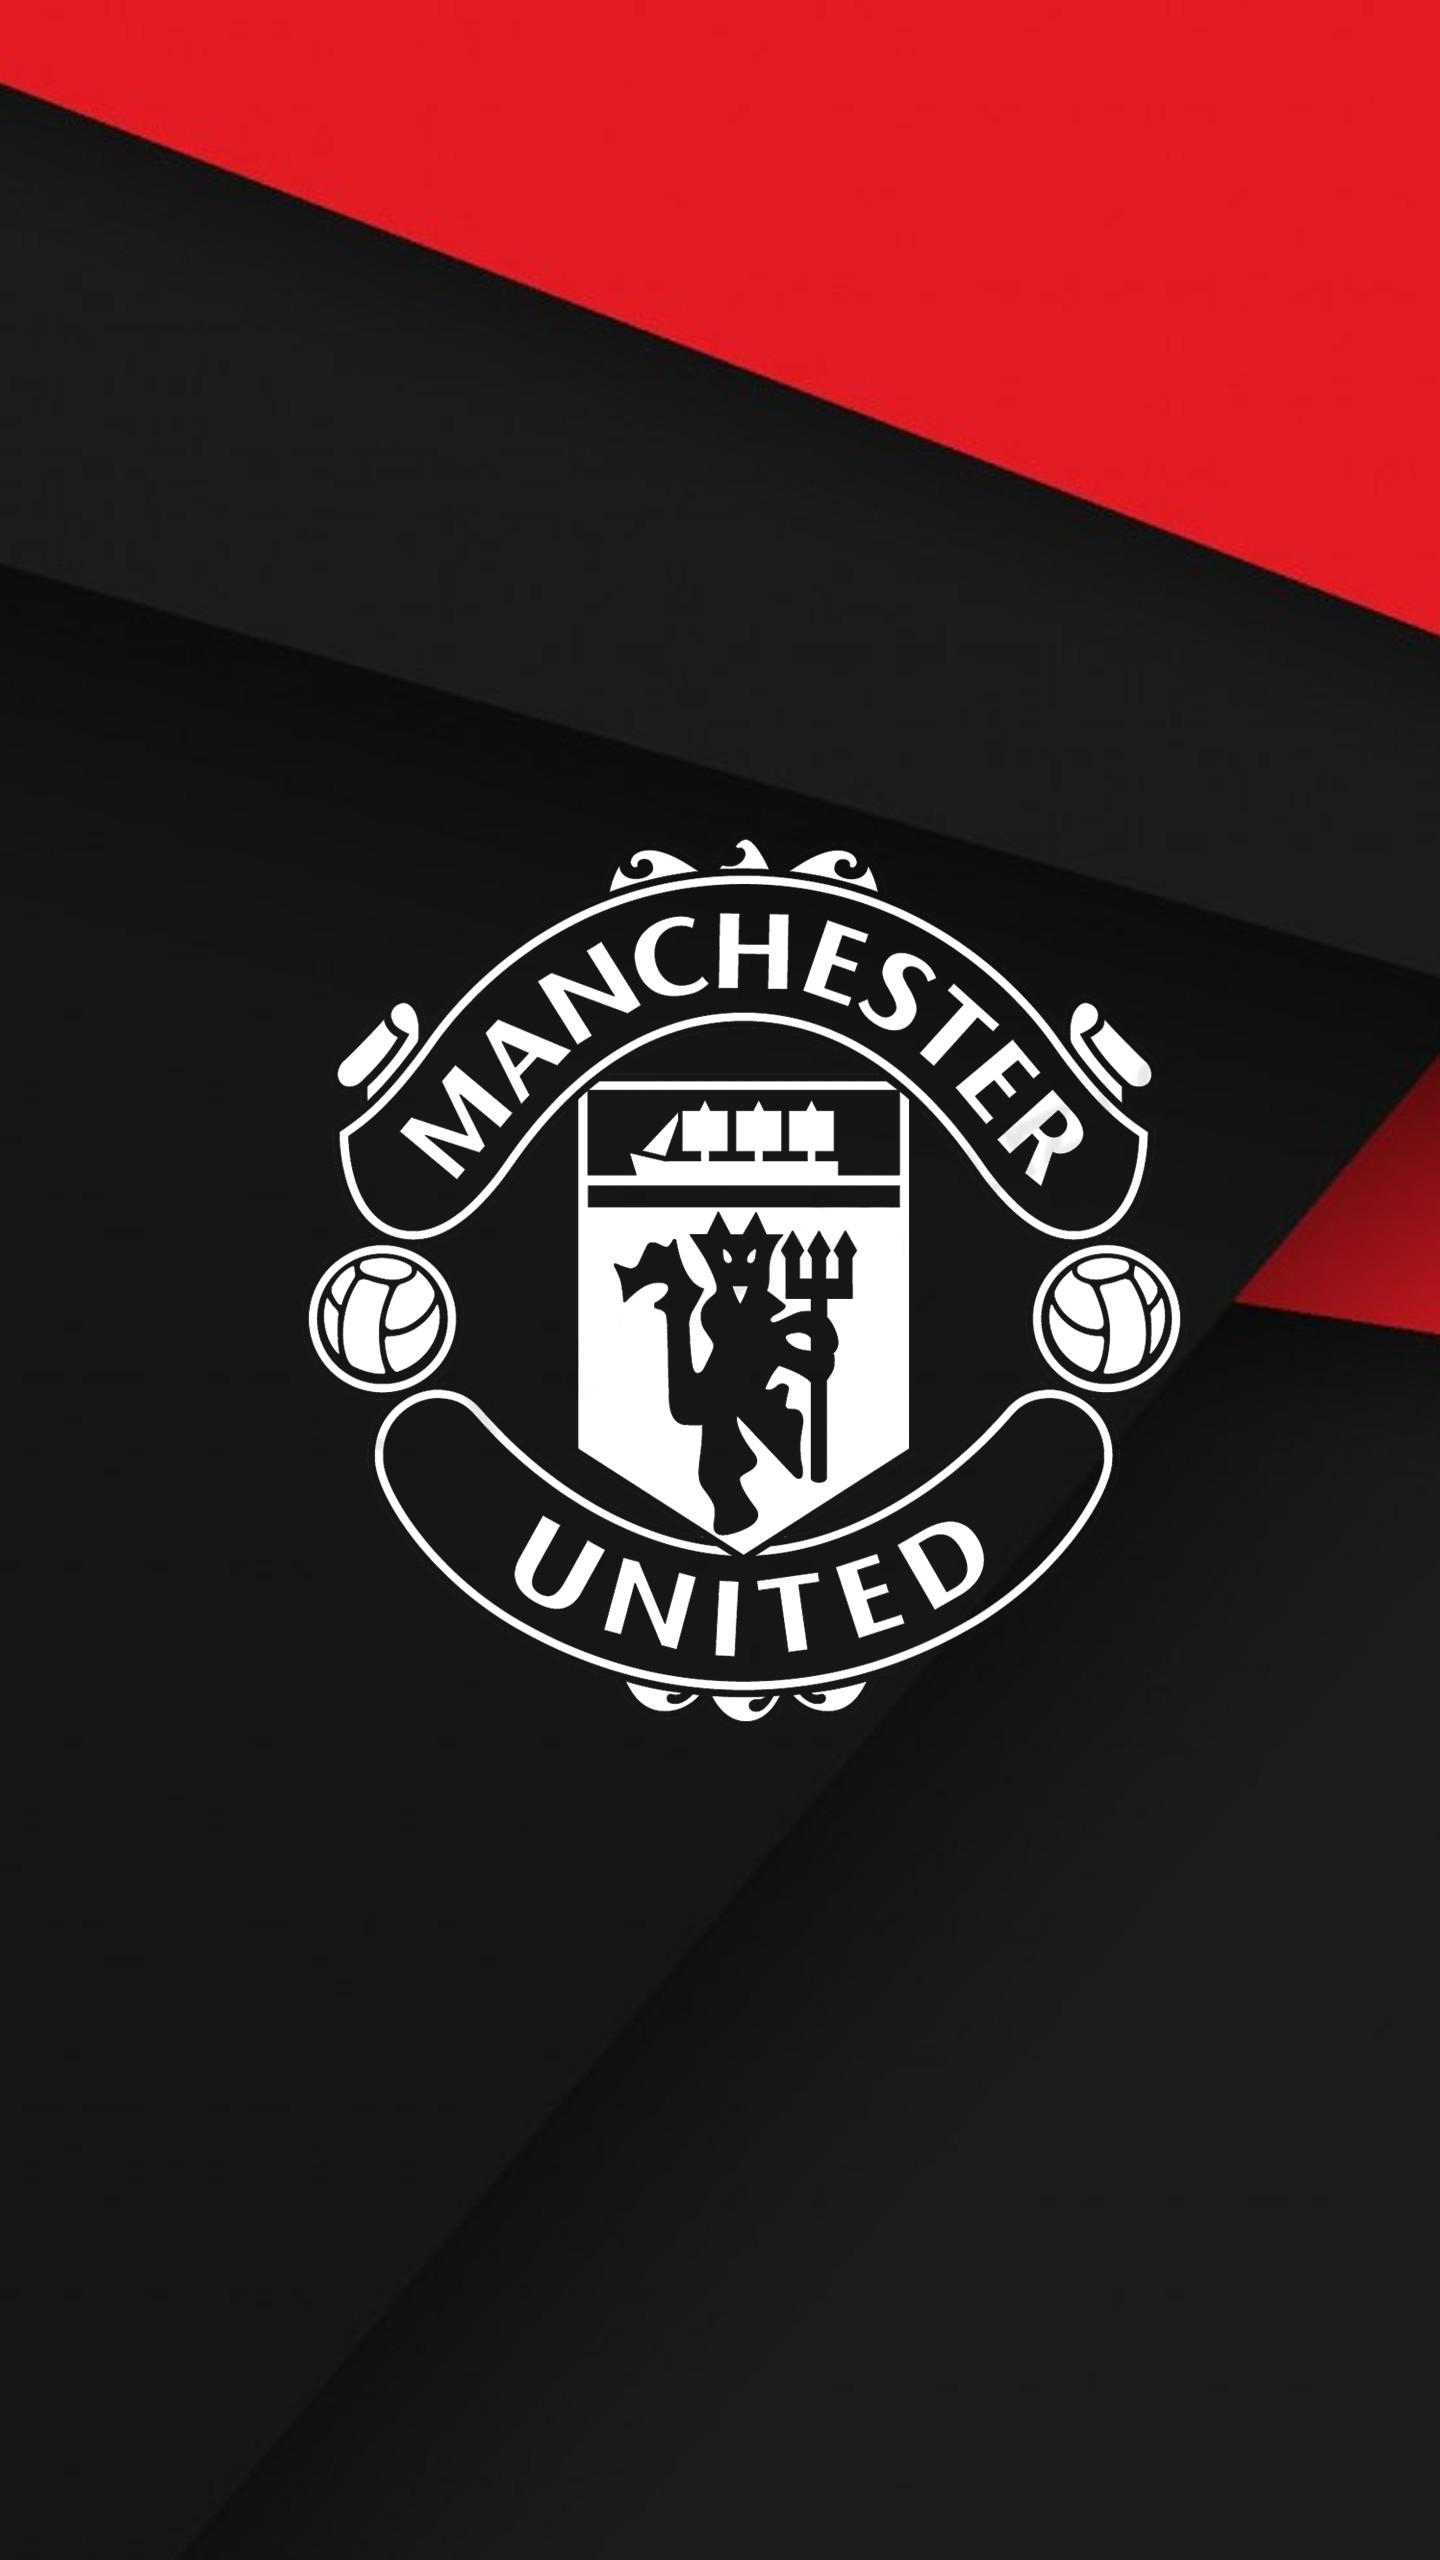 Manchester United Logo Wallpaper 3d Barcelona Logo 2018 Wallpaper 70 Images